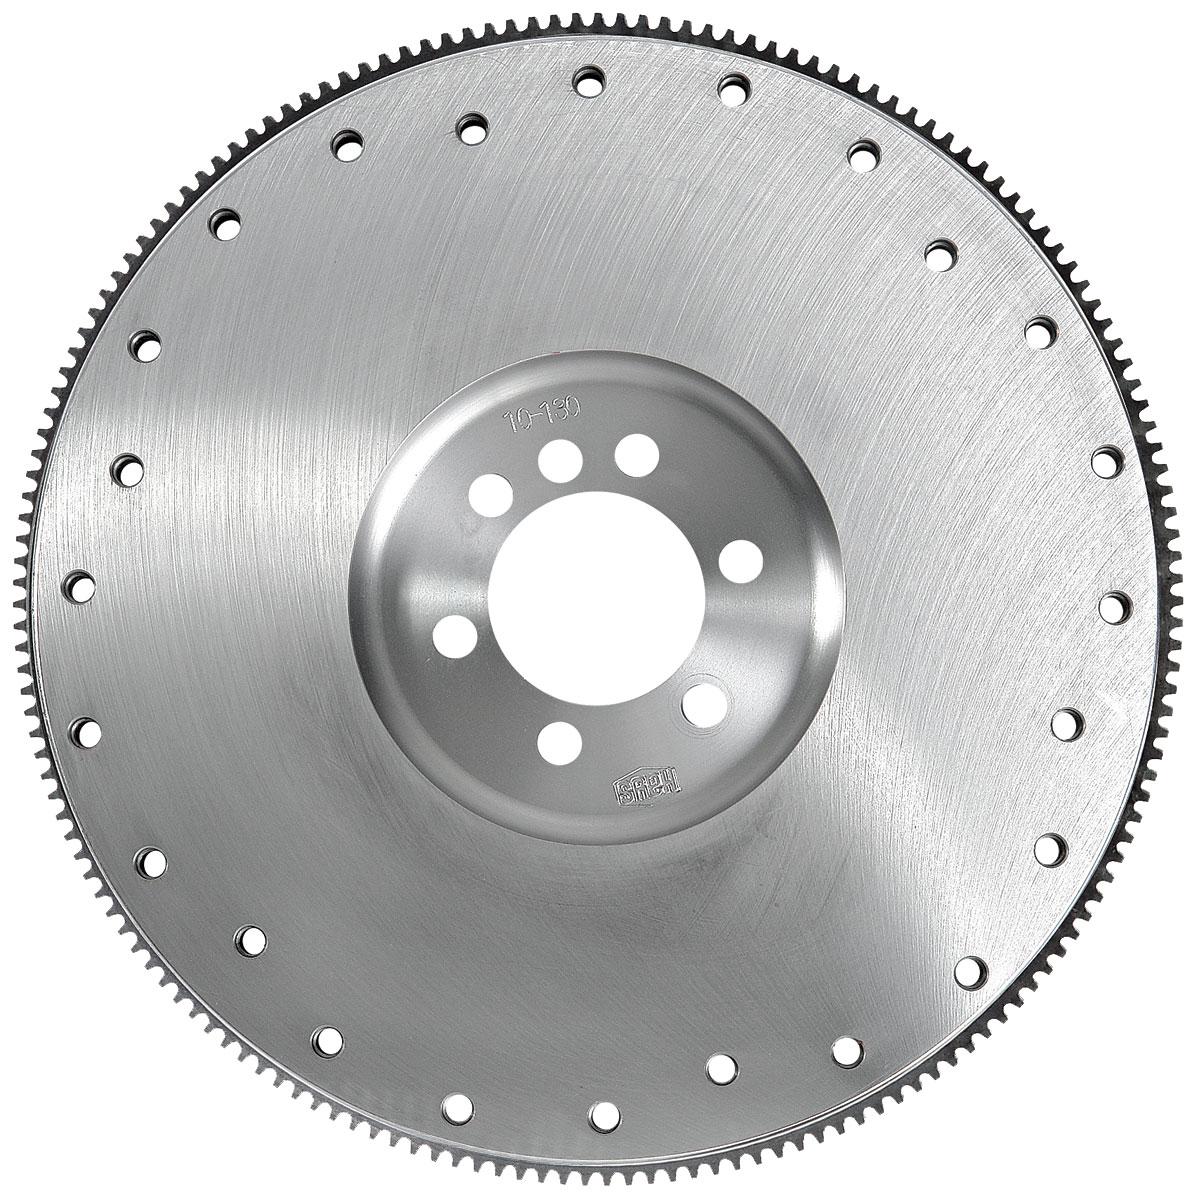 Flywheel, Hays, Chevrolet V8, Internal Balanced, 30LB., 168 Tooth